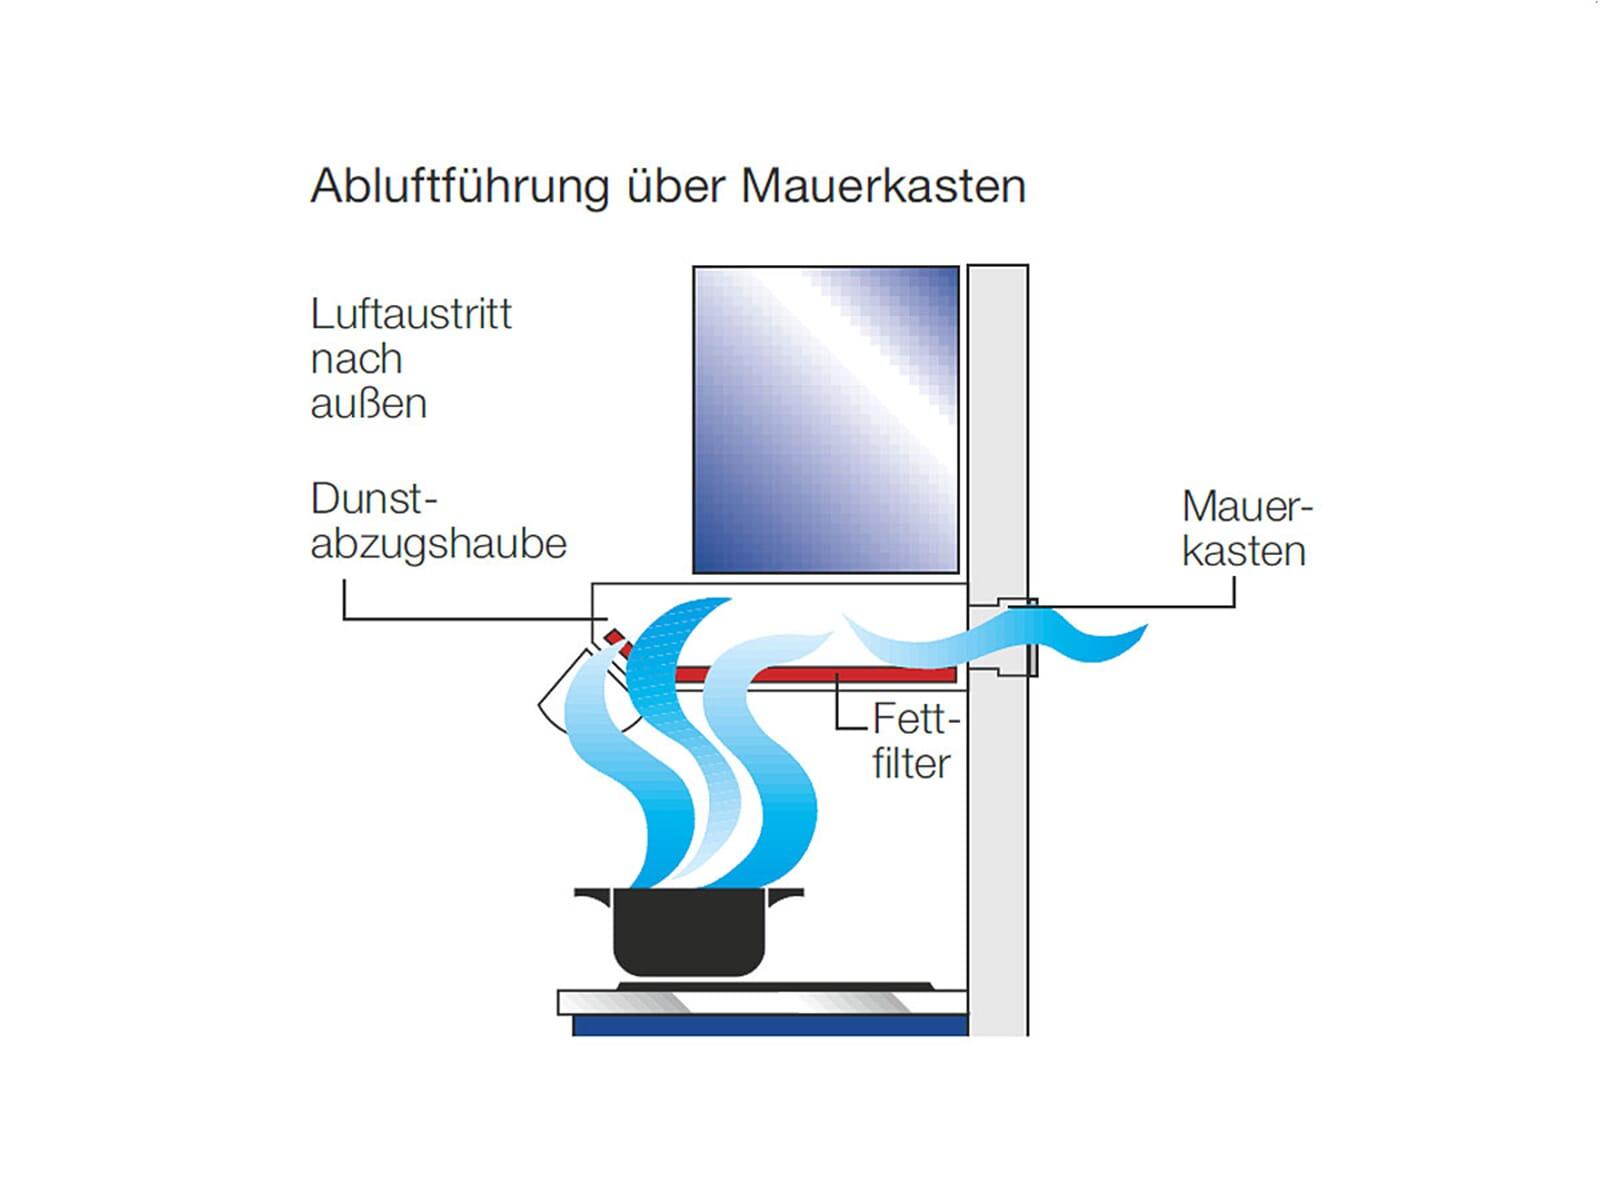 Moebelplus Gmbh zanussi zhp615x flachschirm dunstabzugshaube silber für 114 90 eur shop moebelplus de